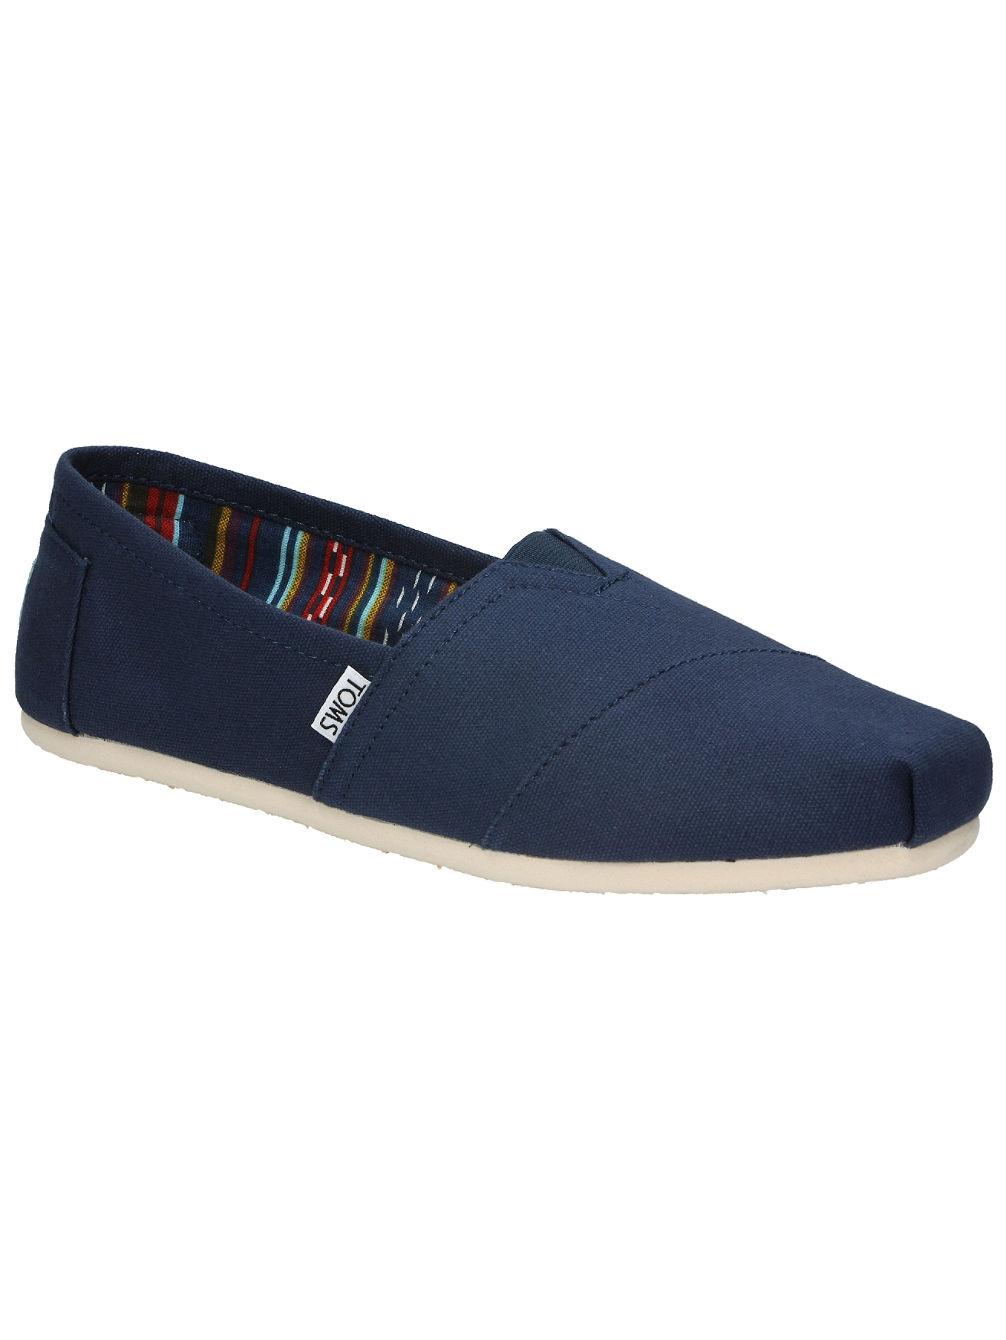 toms-alpargata-classic-slippers